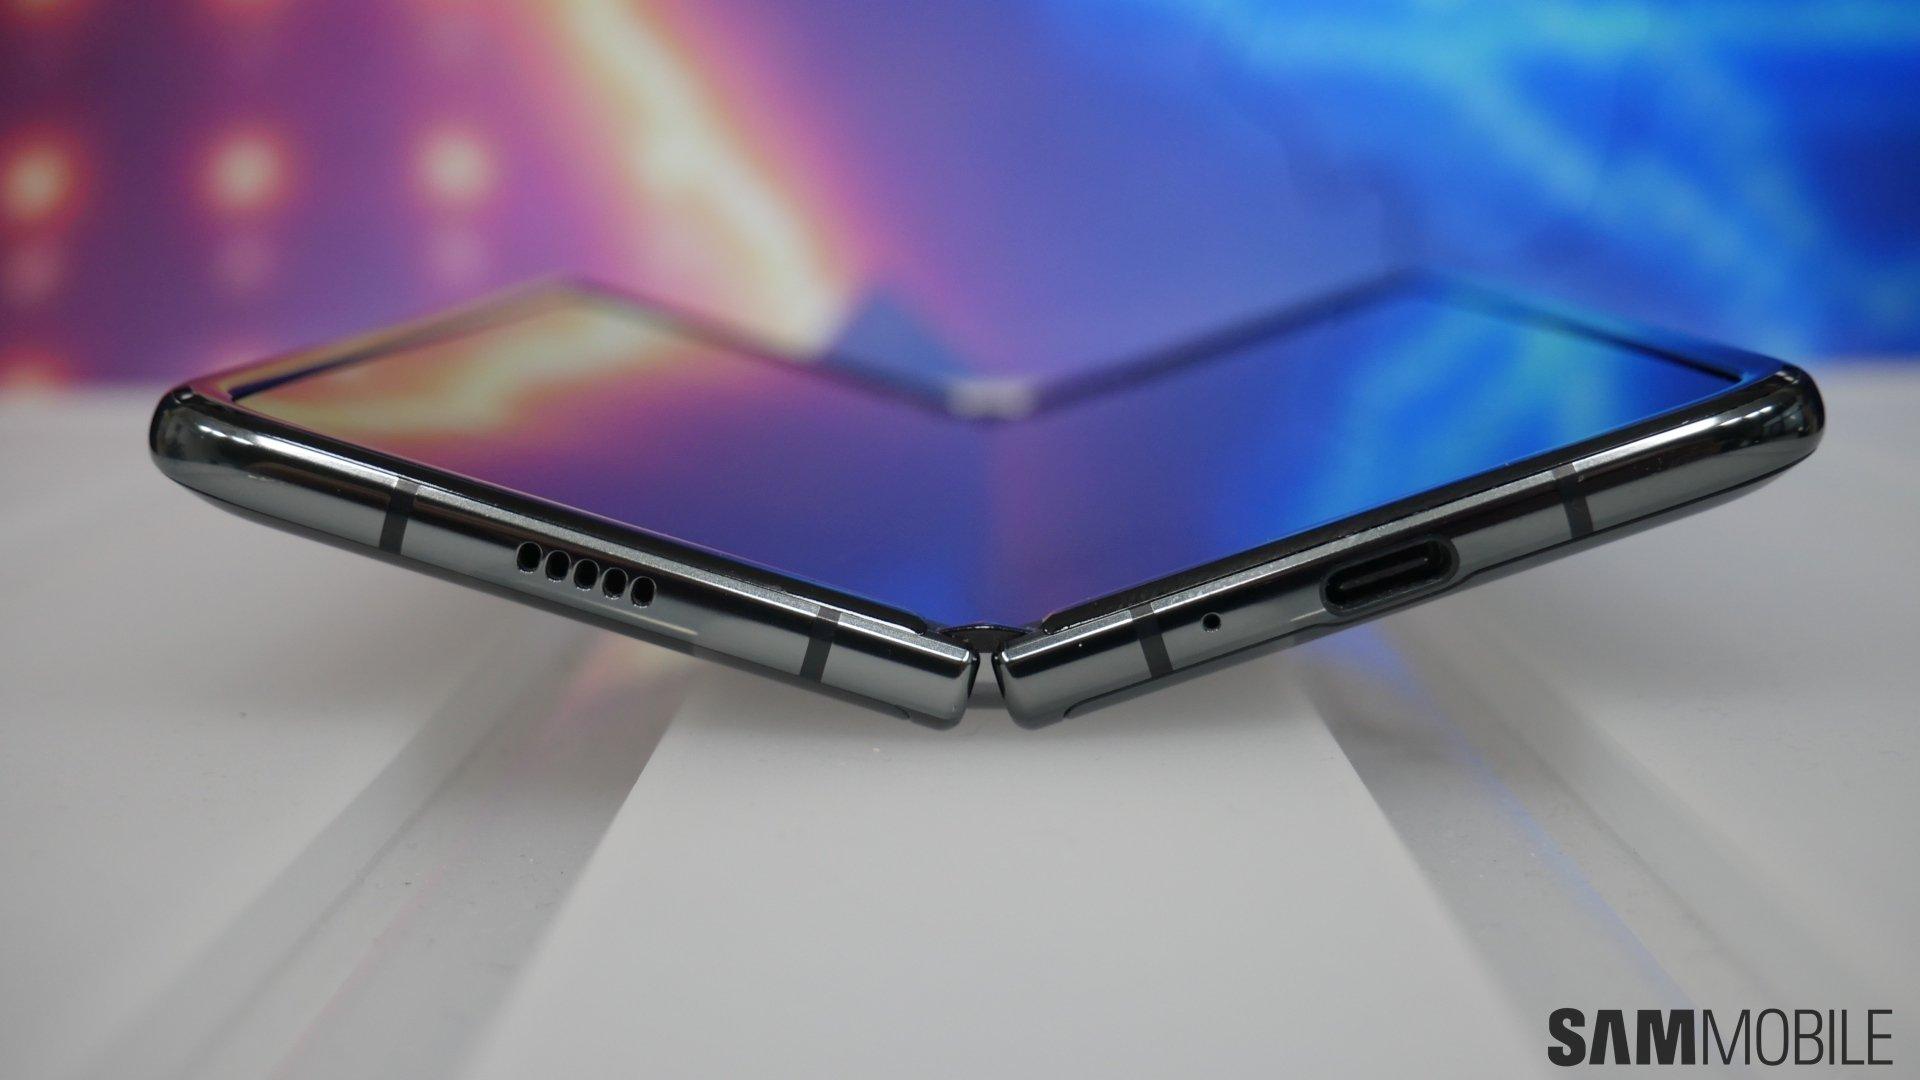 Samsung Galaxy Z Fold2 5g Photos Leaked Funkykit